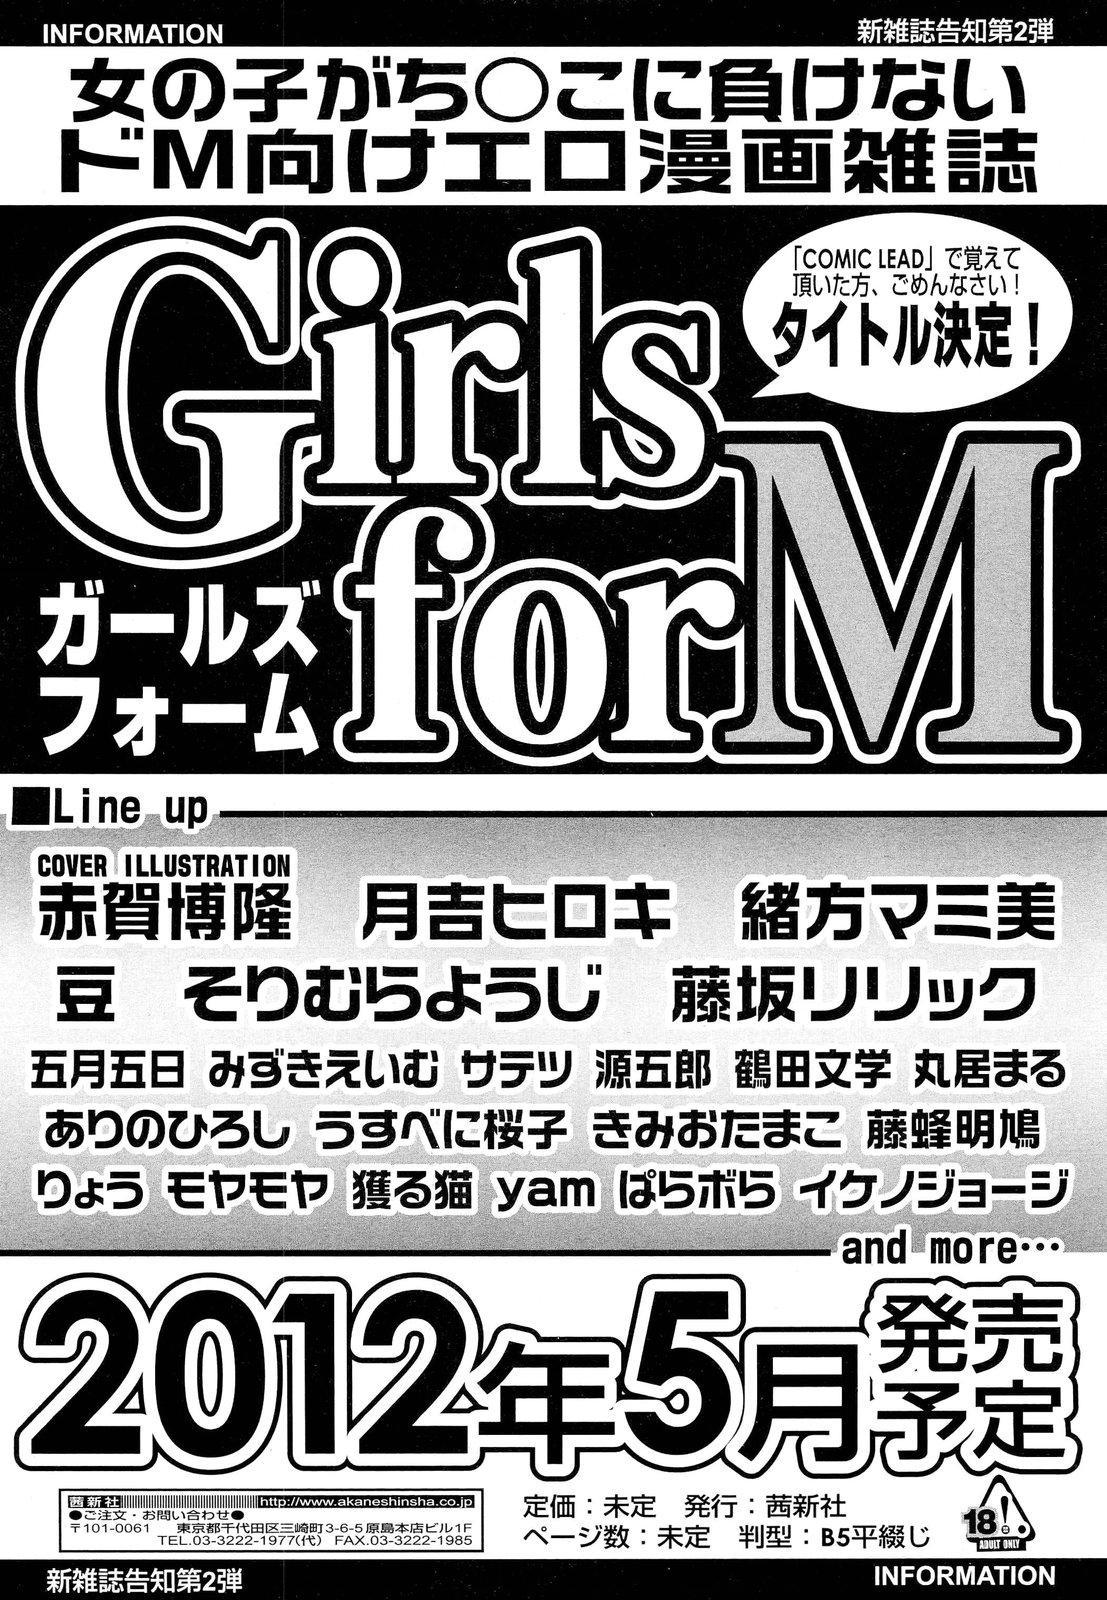 COMIC LO 2012-05 Vol. 98 443